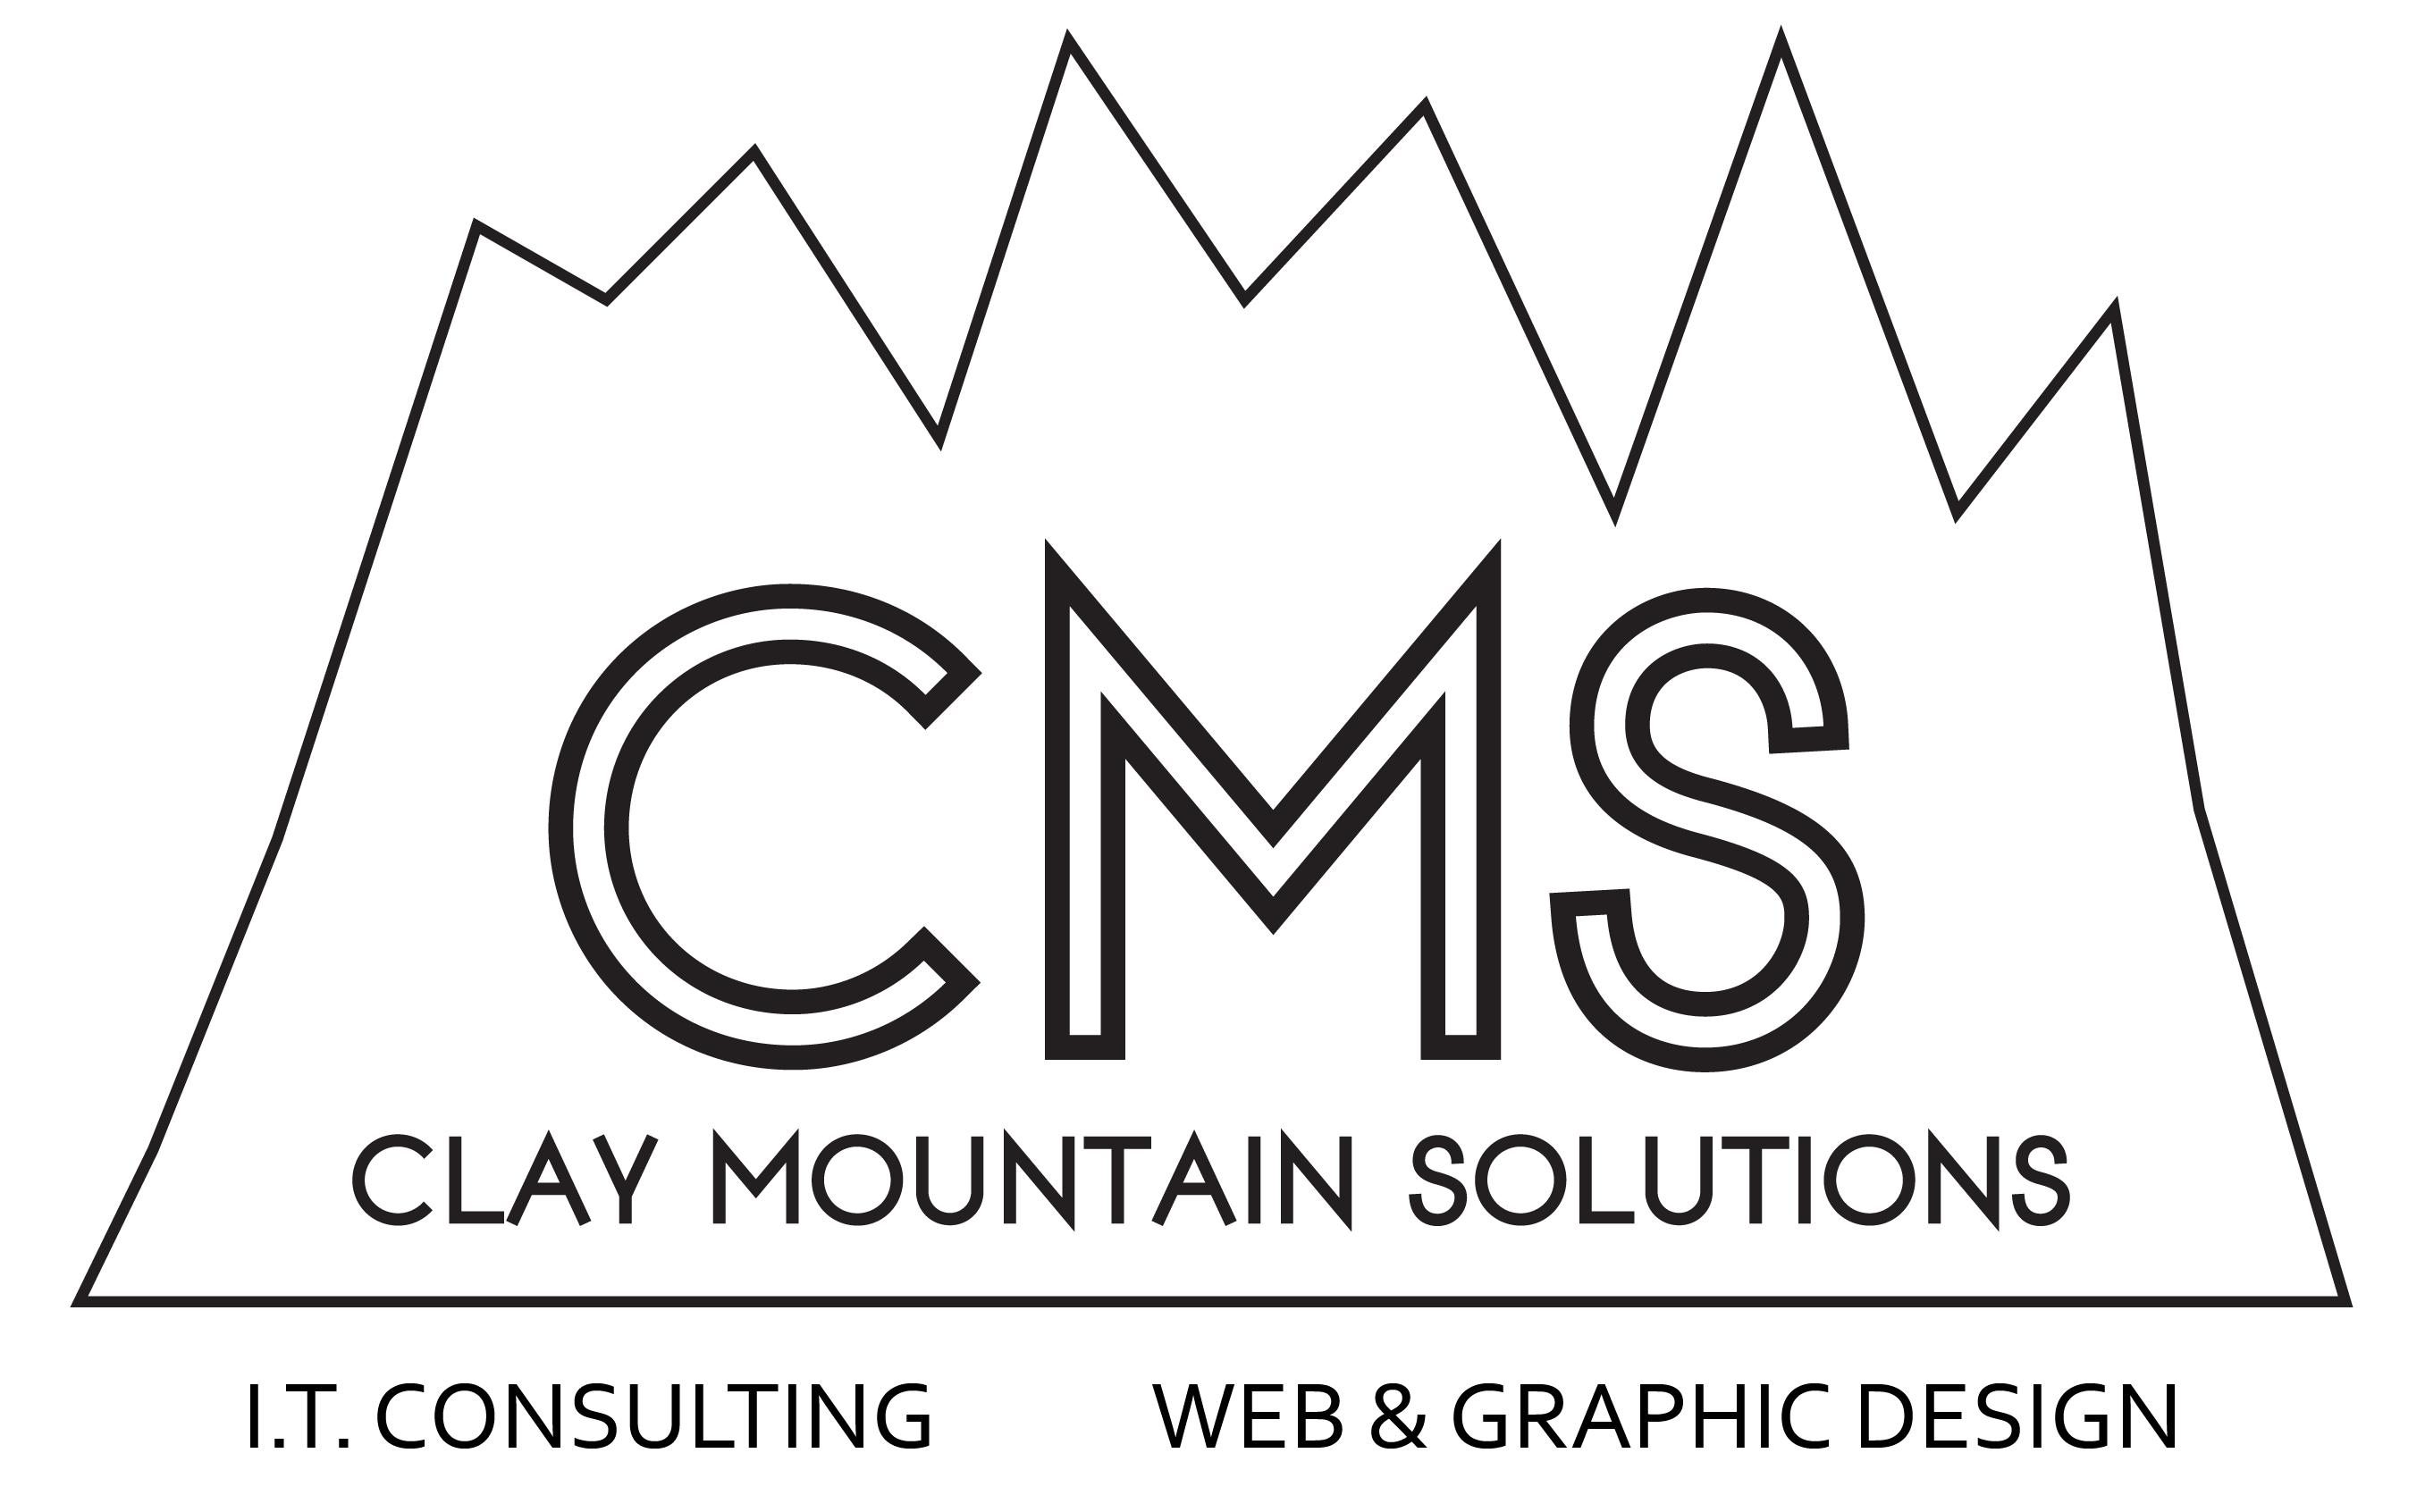 Clay Mountain Solutions logo